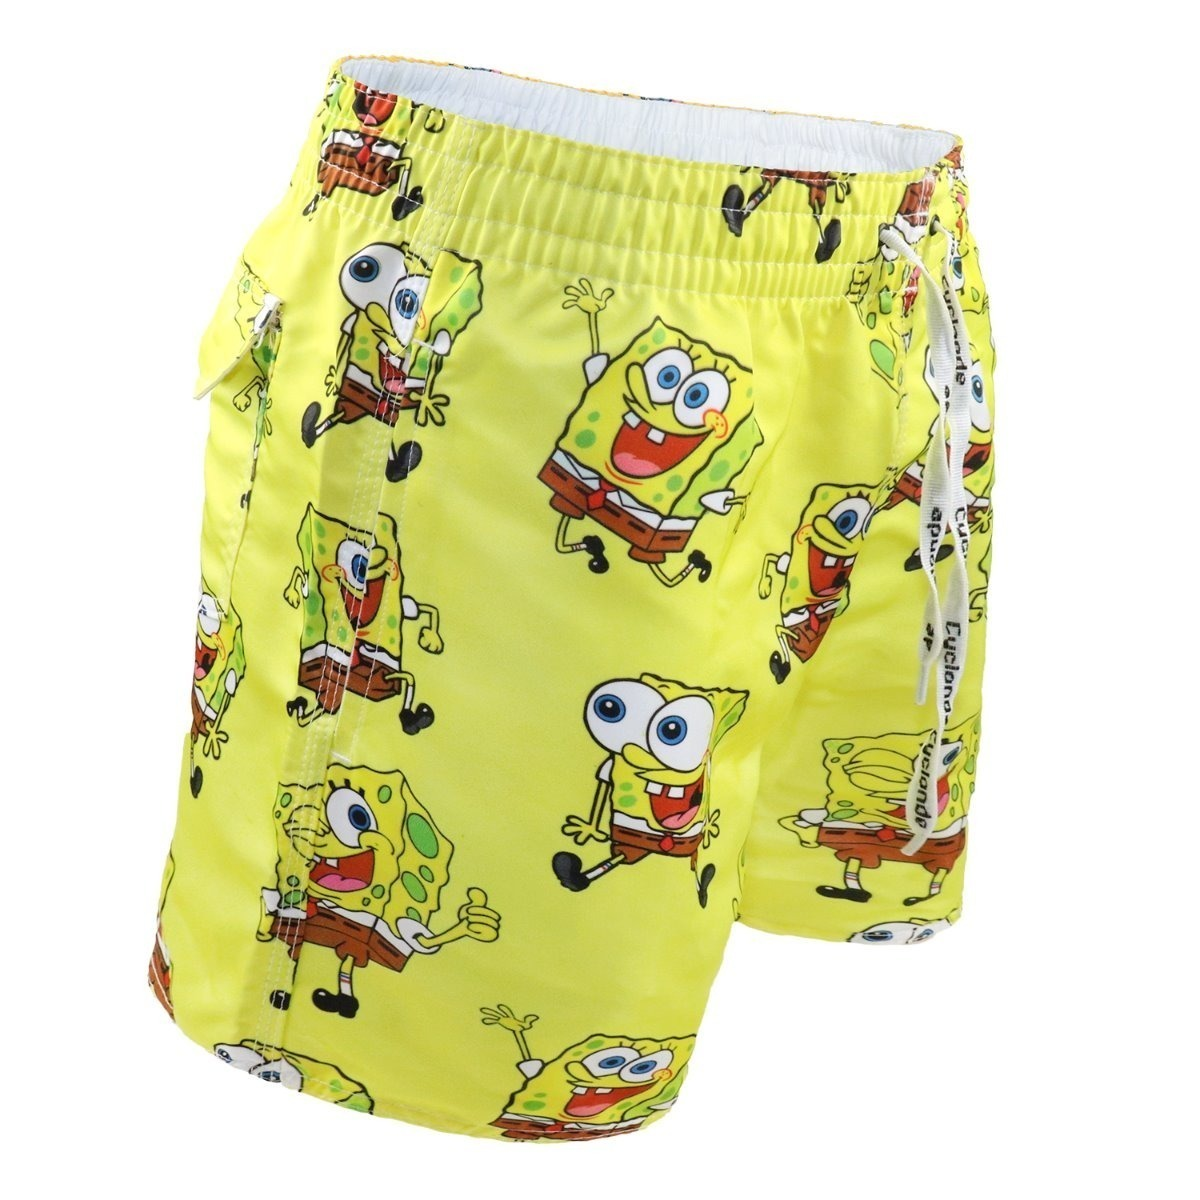 Kit 10 Shorts Mauricinho Bermudas Moda Praia Estilo Neymar